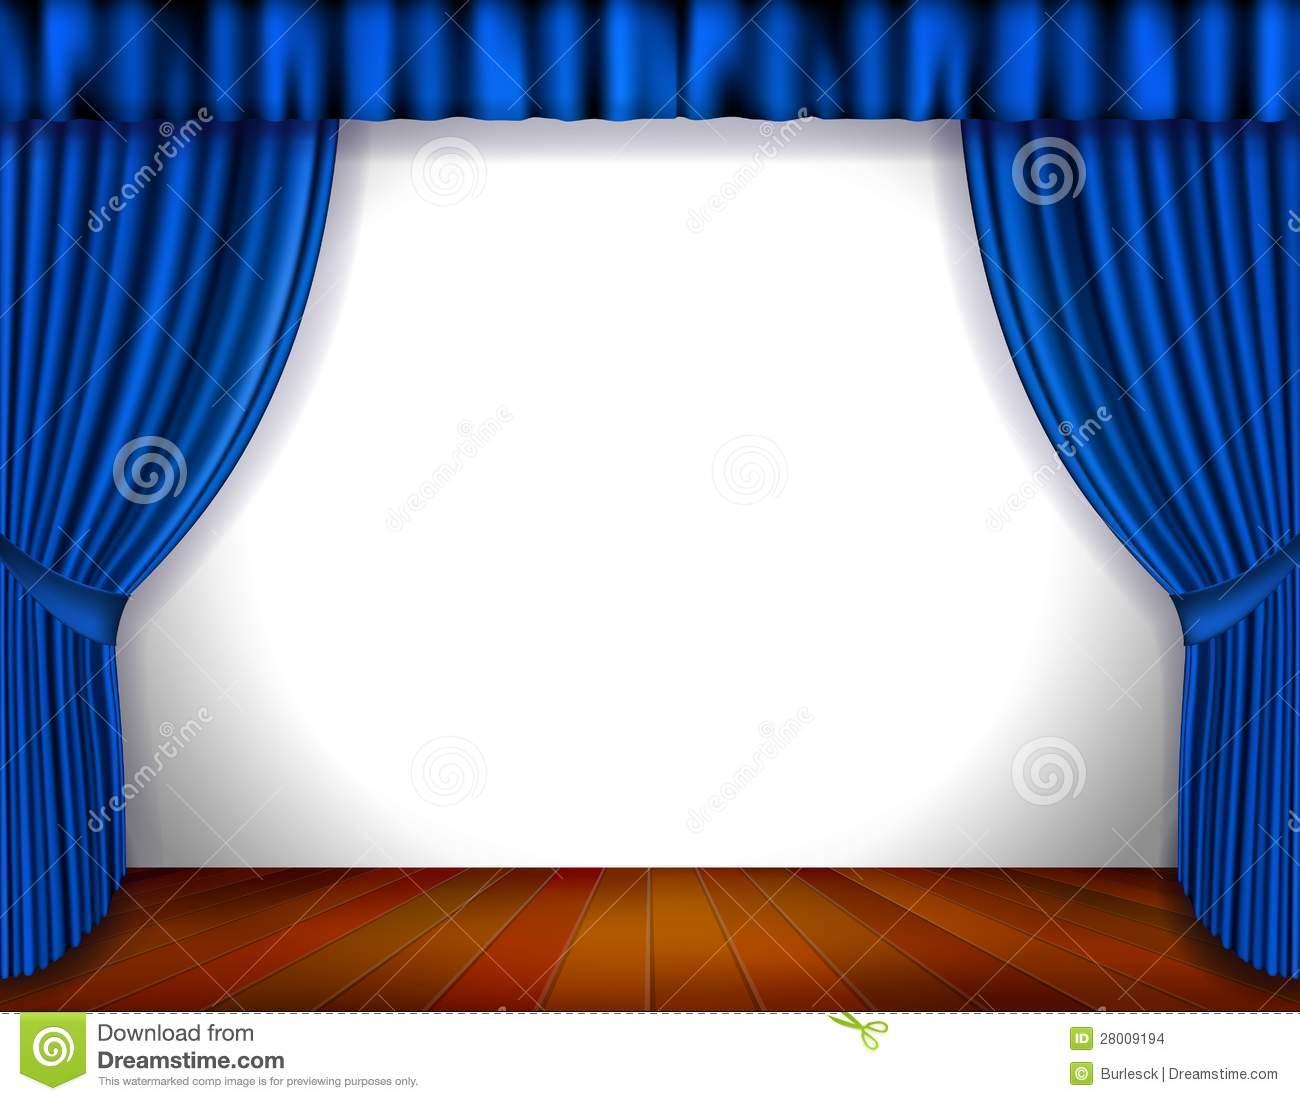 Curtain clipart blue curtain Curtains clipart Clipart stage blue